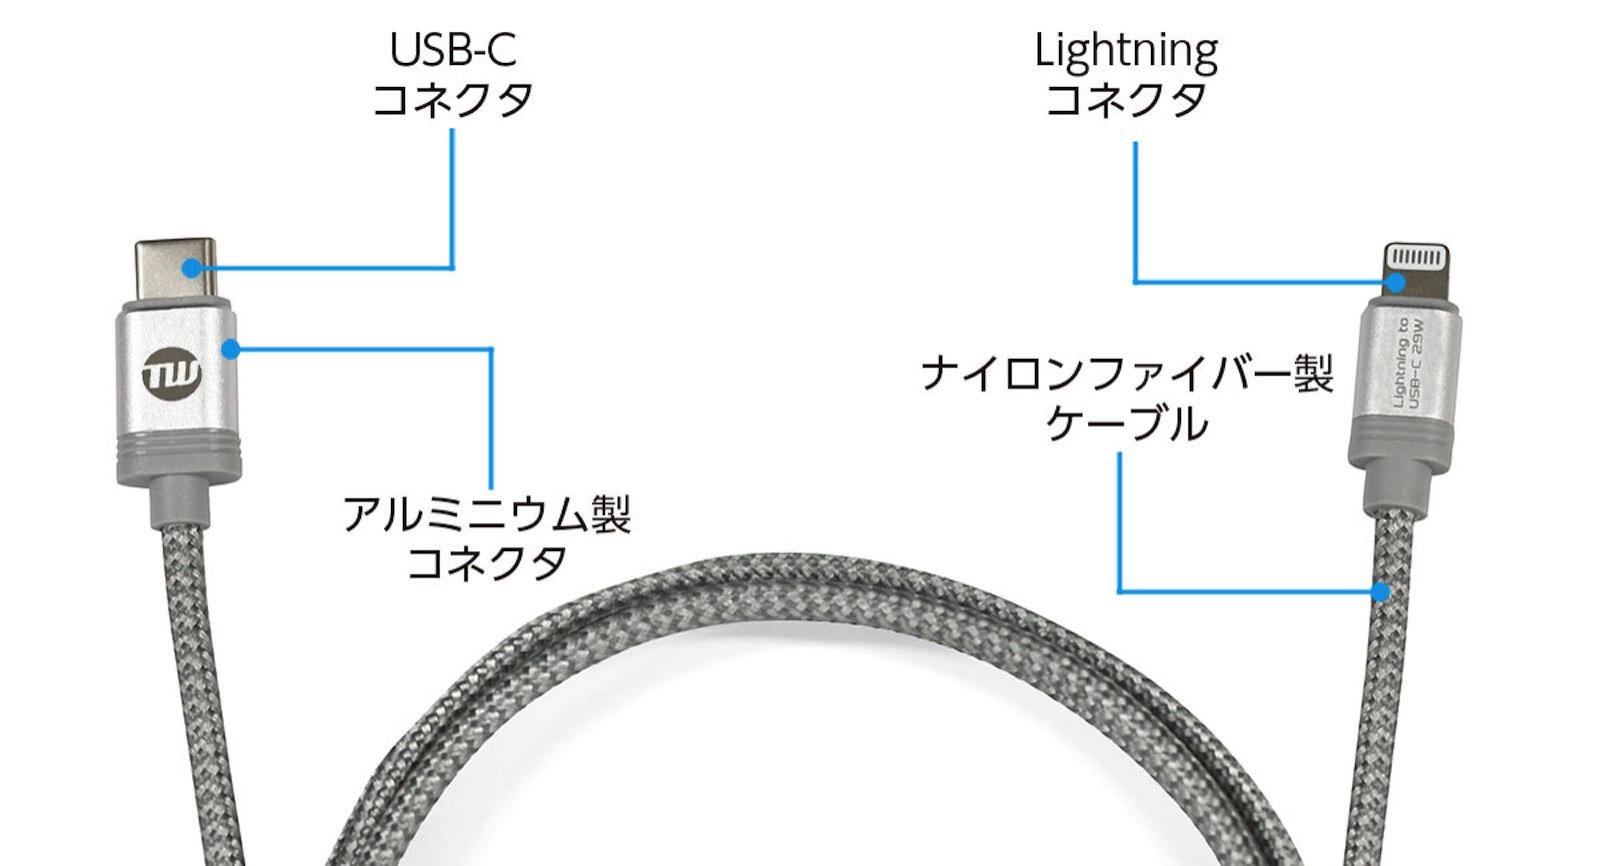 TUNEWEAR TUNEWIRE C L Lightning USBC Cable2